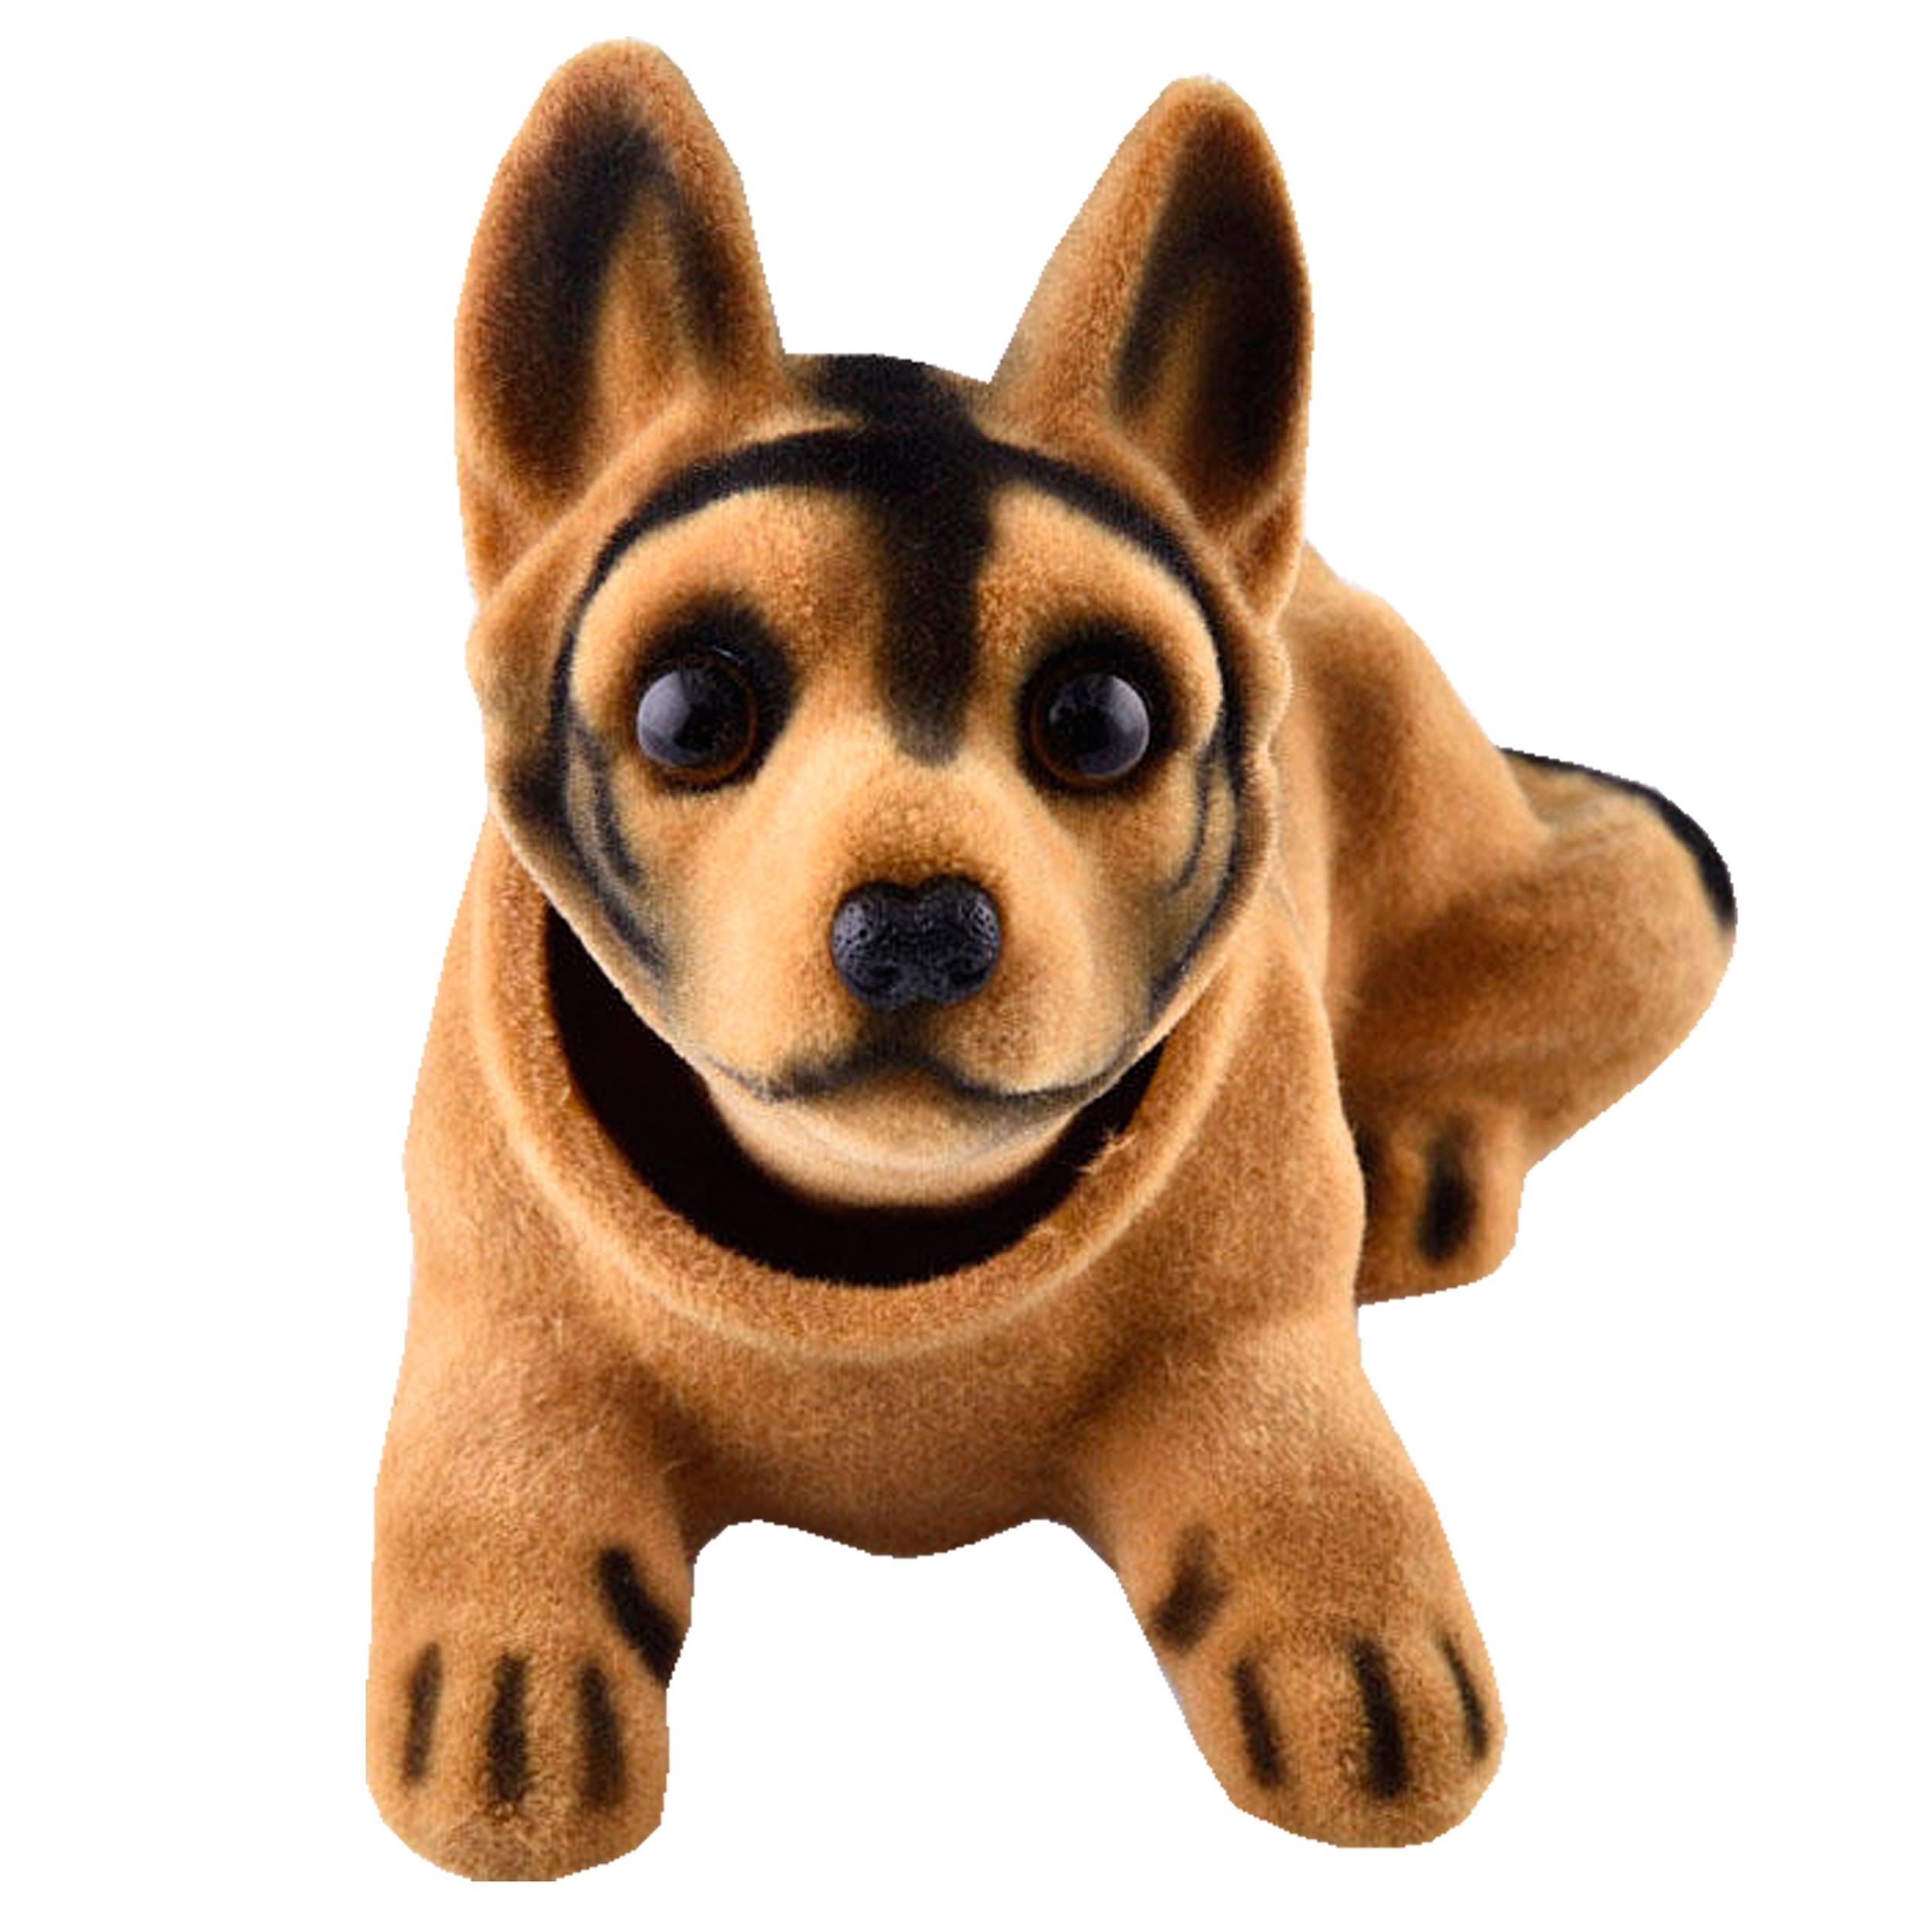 عروسک روی داشبورد سر متحرک  مدل Shepherd Dog thumb